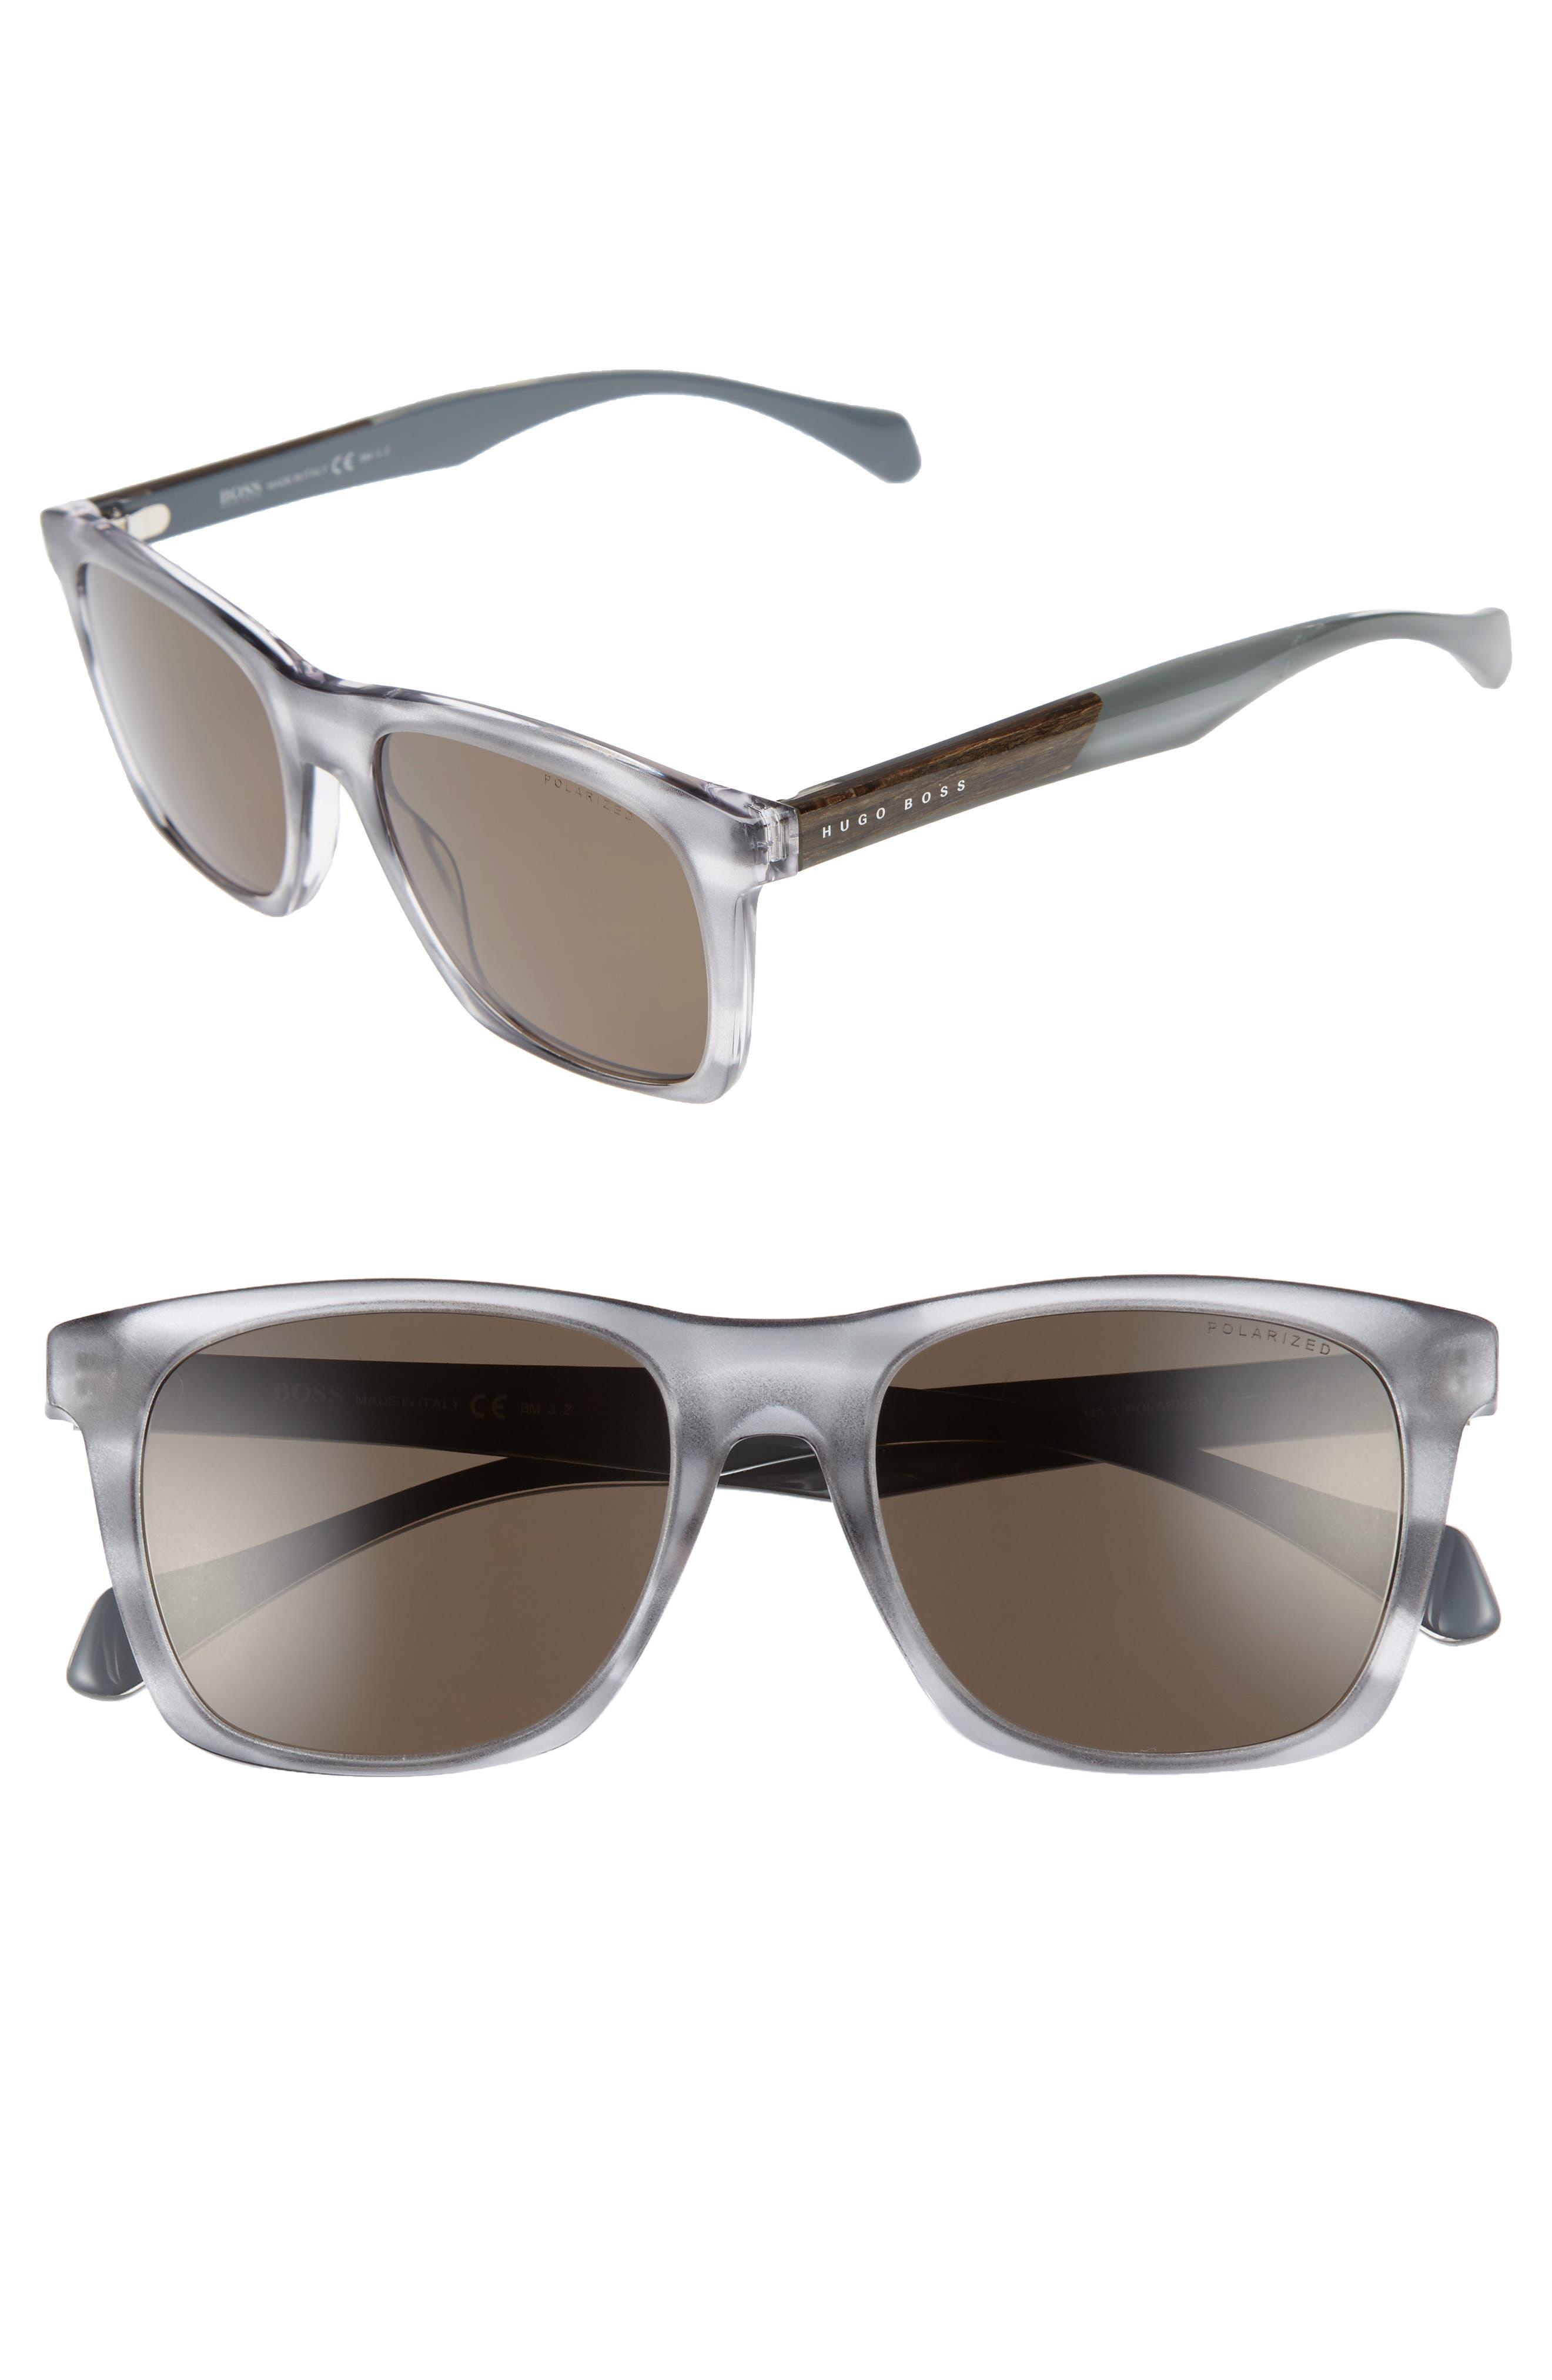 53mm Sunglasses,                         Main,                         color, 020